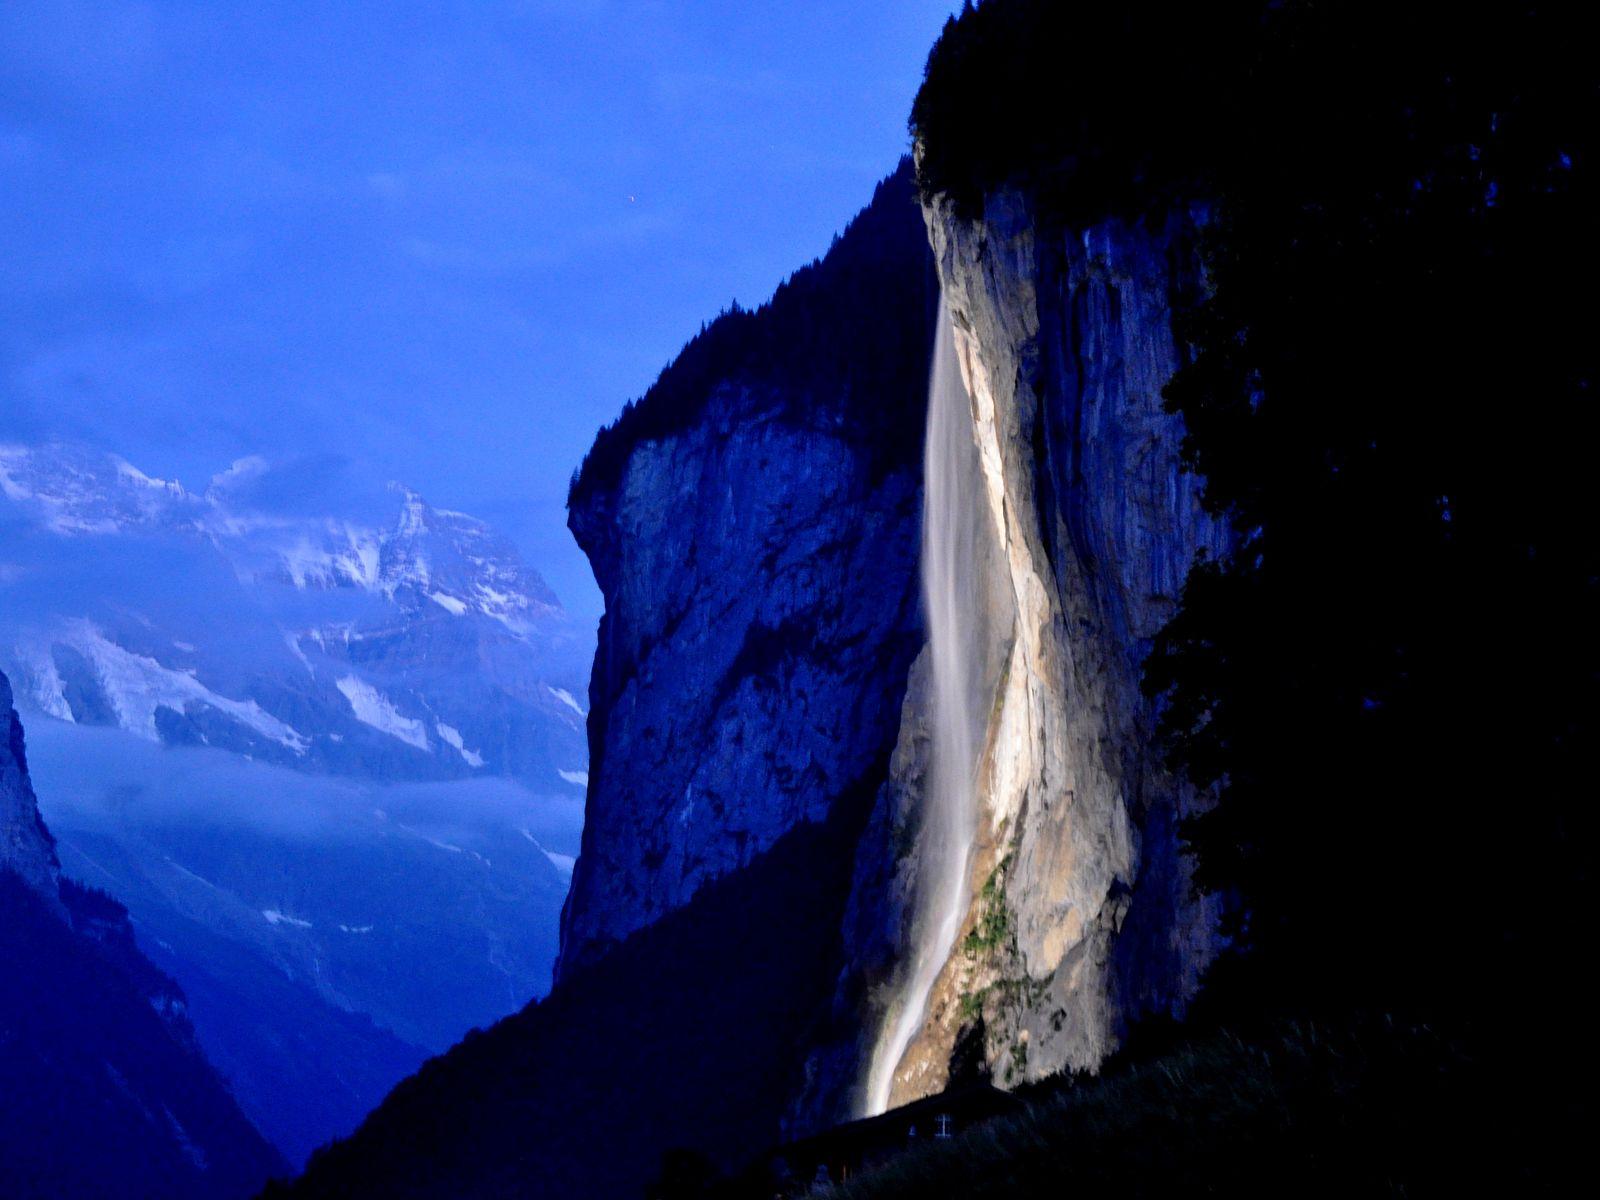 Водопад Штауббах вечером